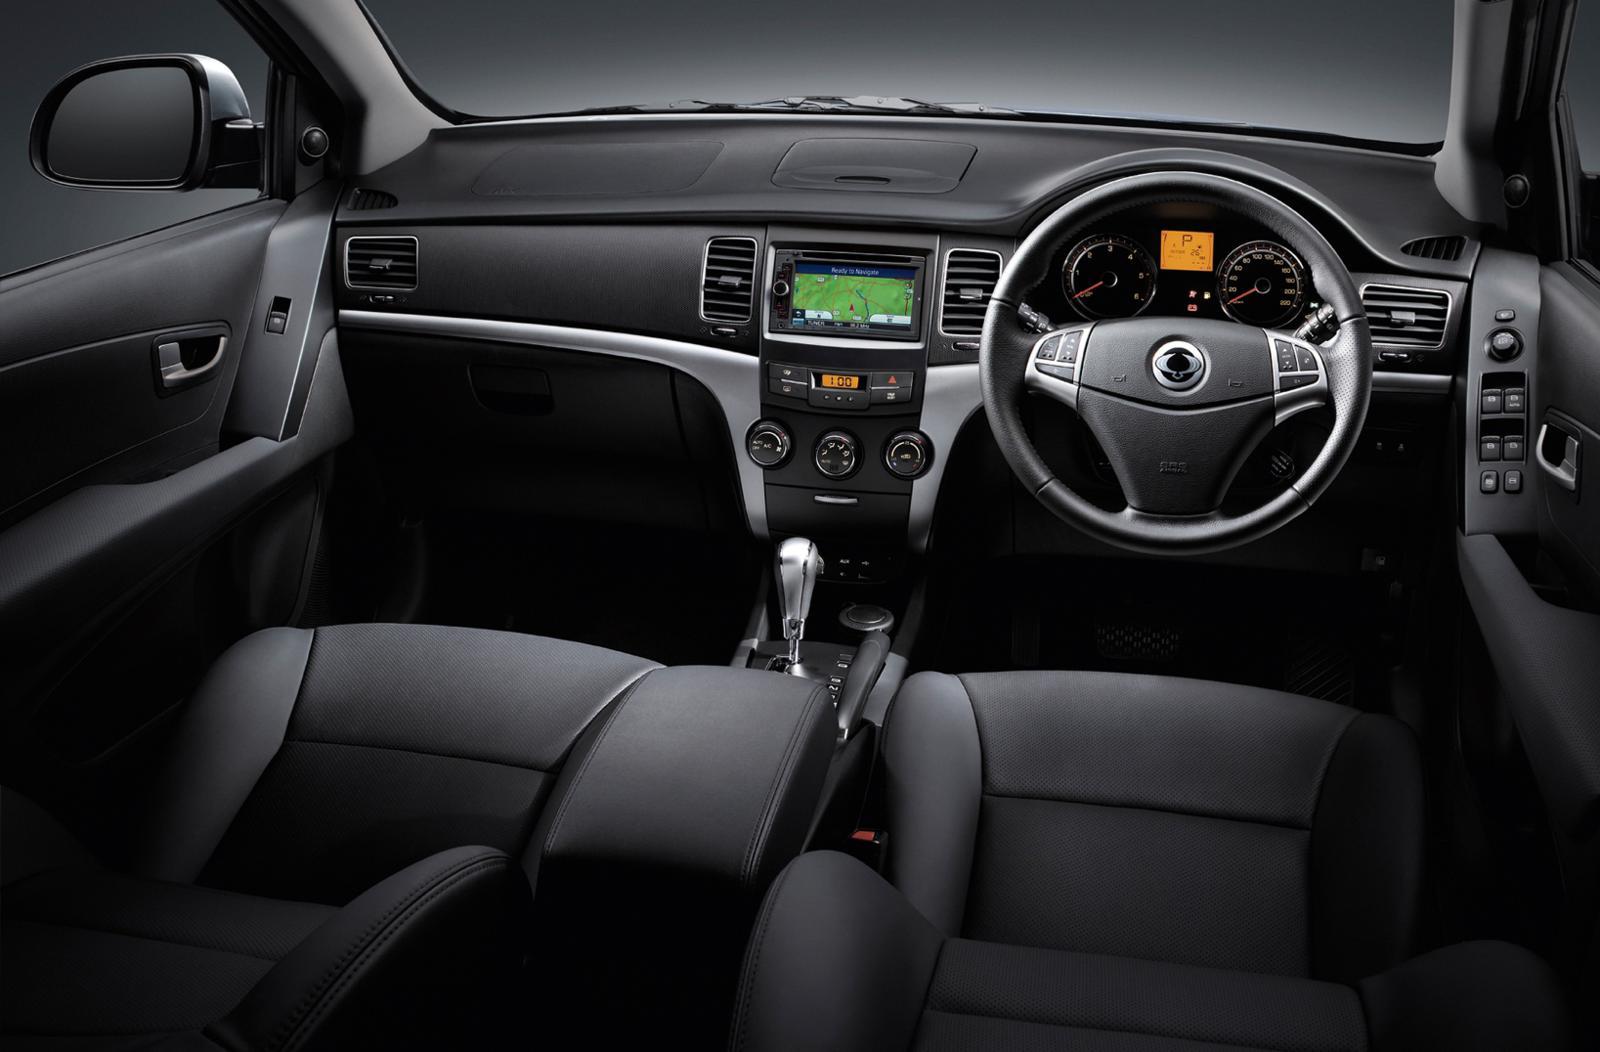 Ssangyong Korando 2012 Interior Front Seat Driver